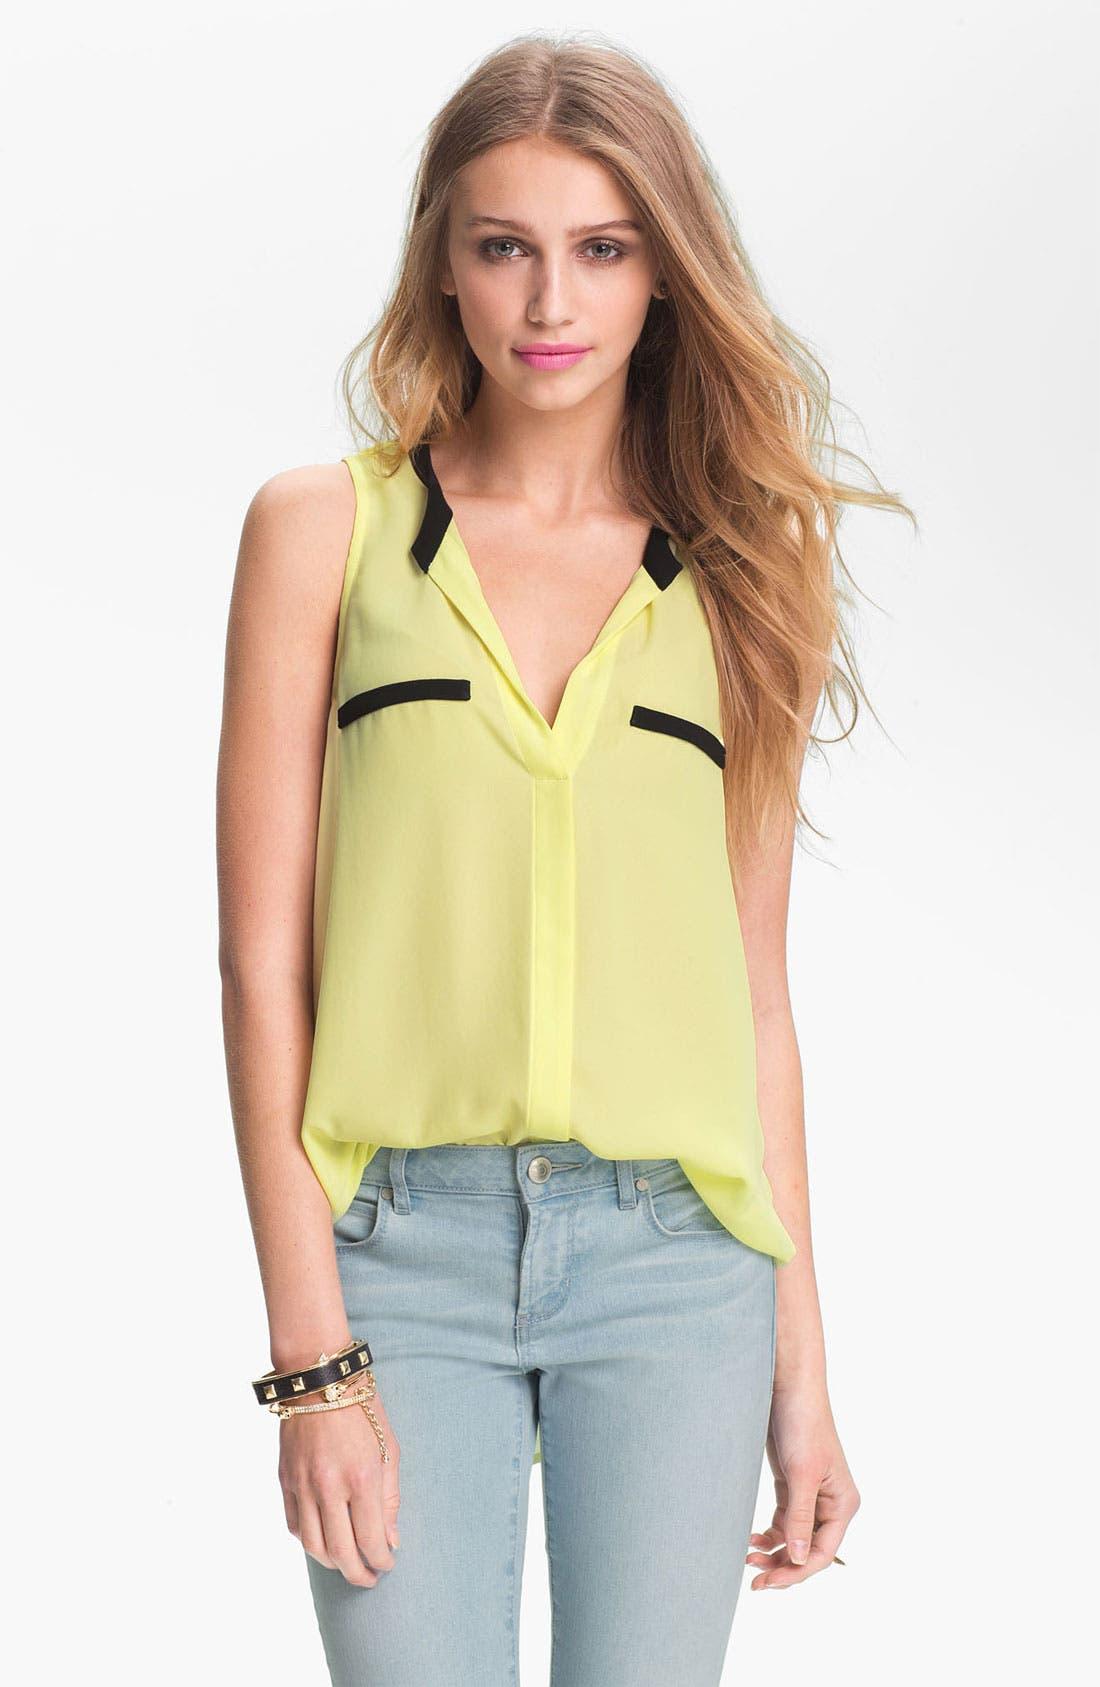 Alternate Image 1 Selected - Lush Contrast Trim Sleeveless Chiffon Shirt (Juniors)